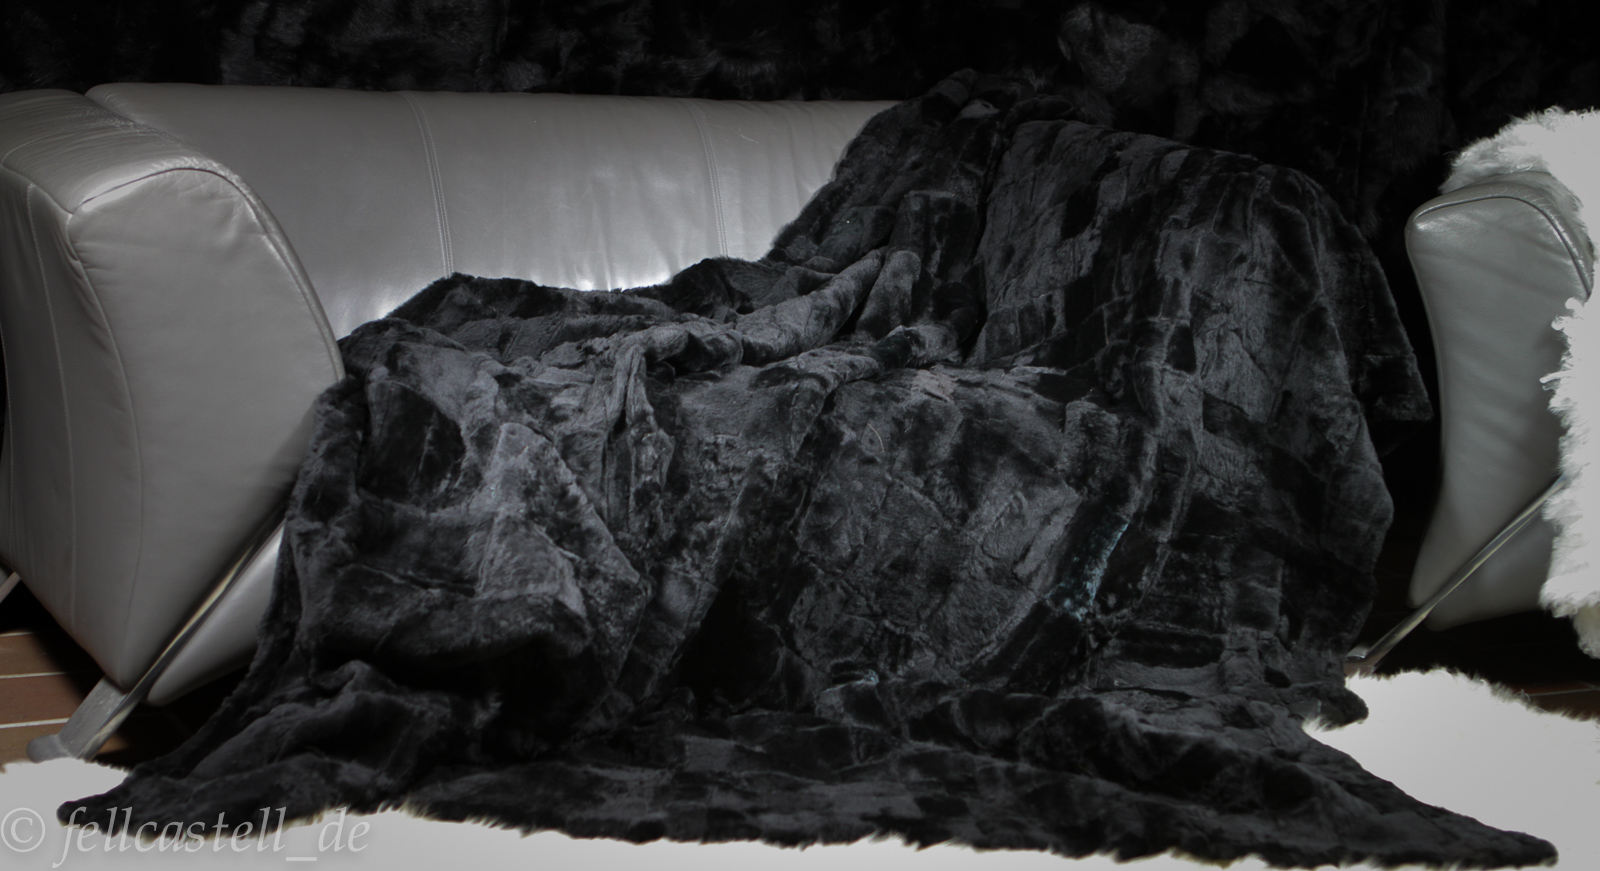 Lammfelldecke 200 x 155 cm schwarz Patchwork abgefüttert